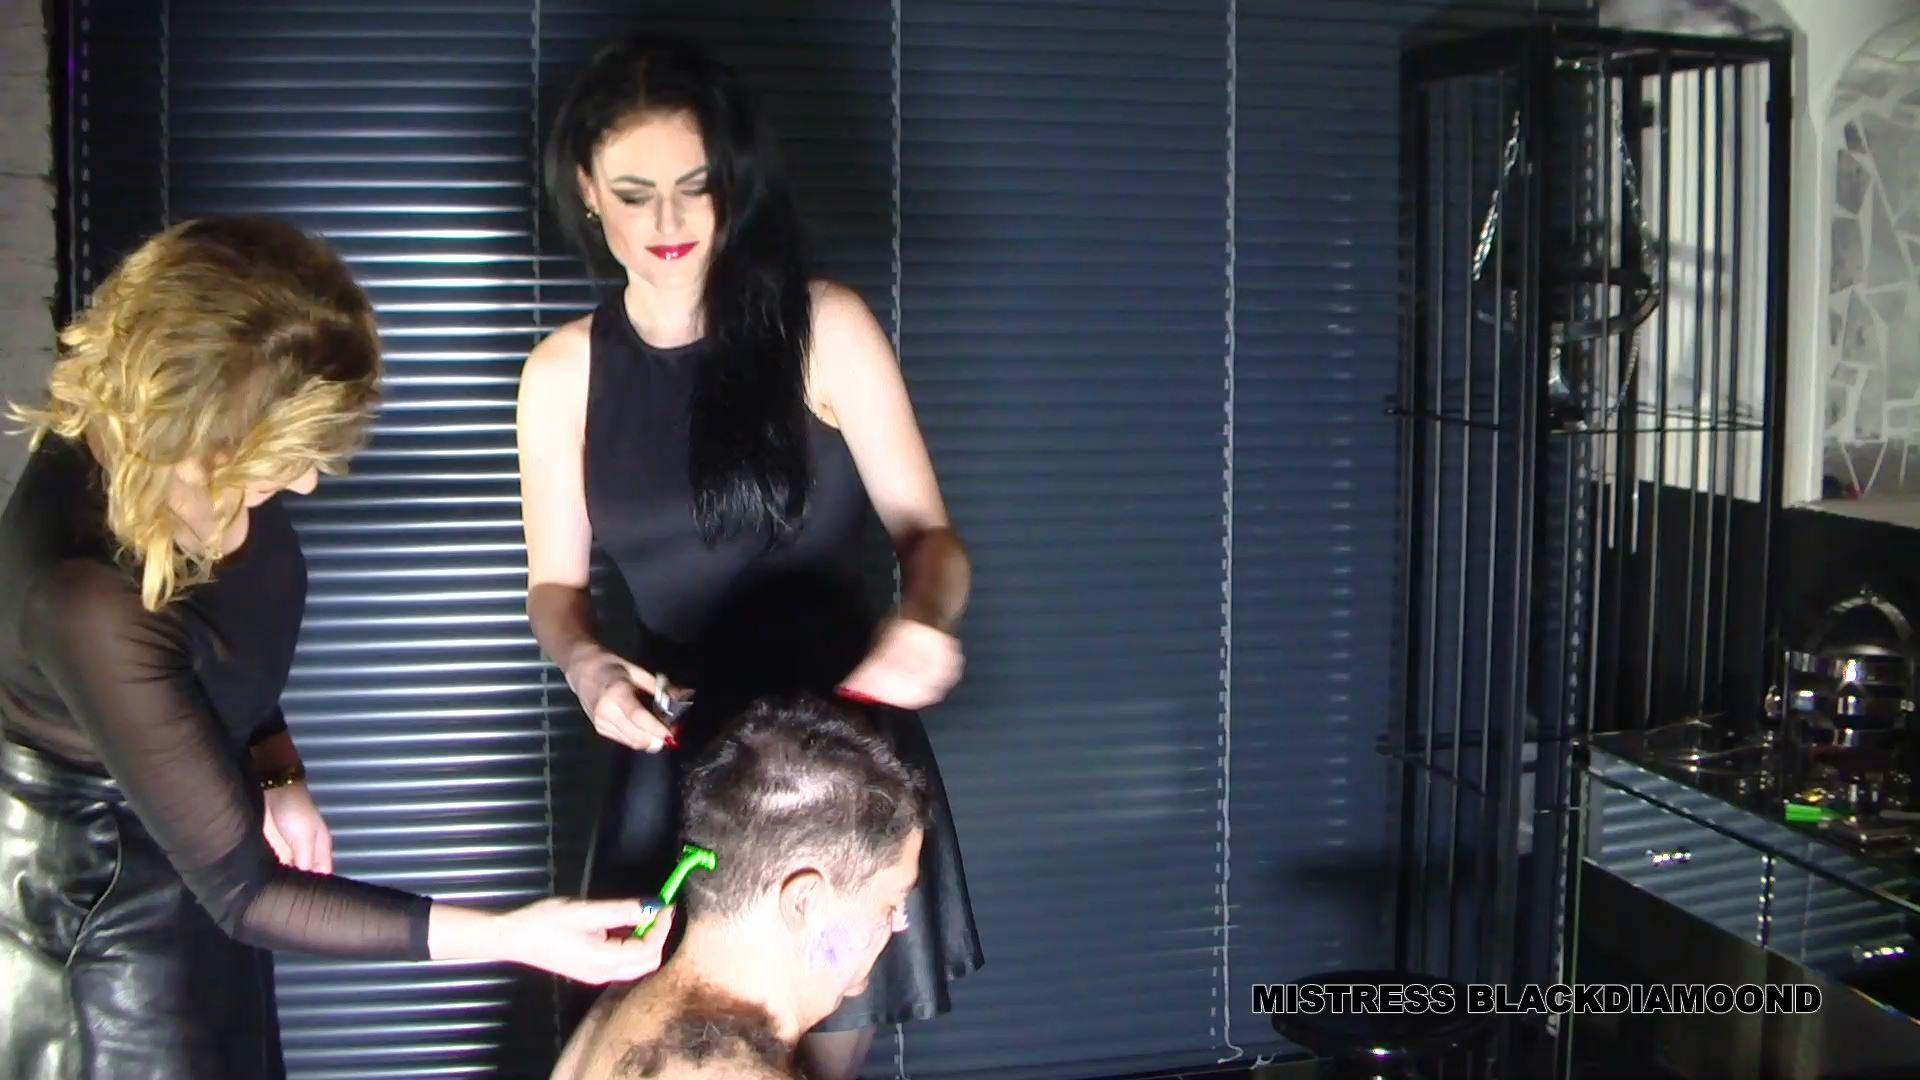 Mistress Blackdiamoond In Scene: Slave smeared and circumcised - CLIPS4SALE / MISTRESS BLACKDIAMOOND - FULL HD/1080p/MP4